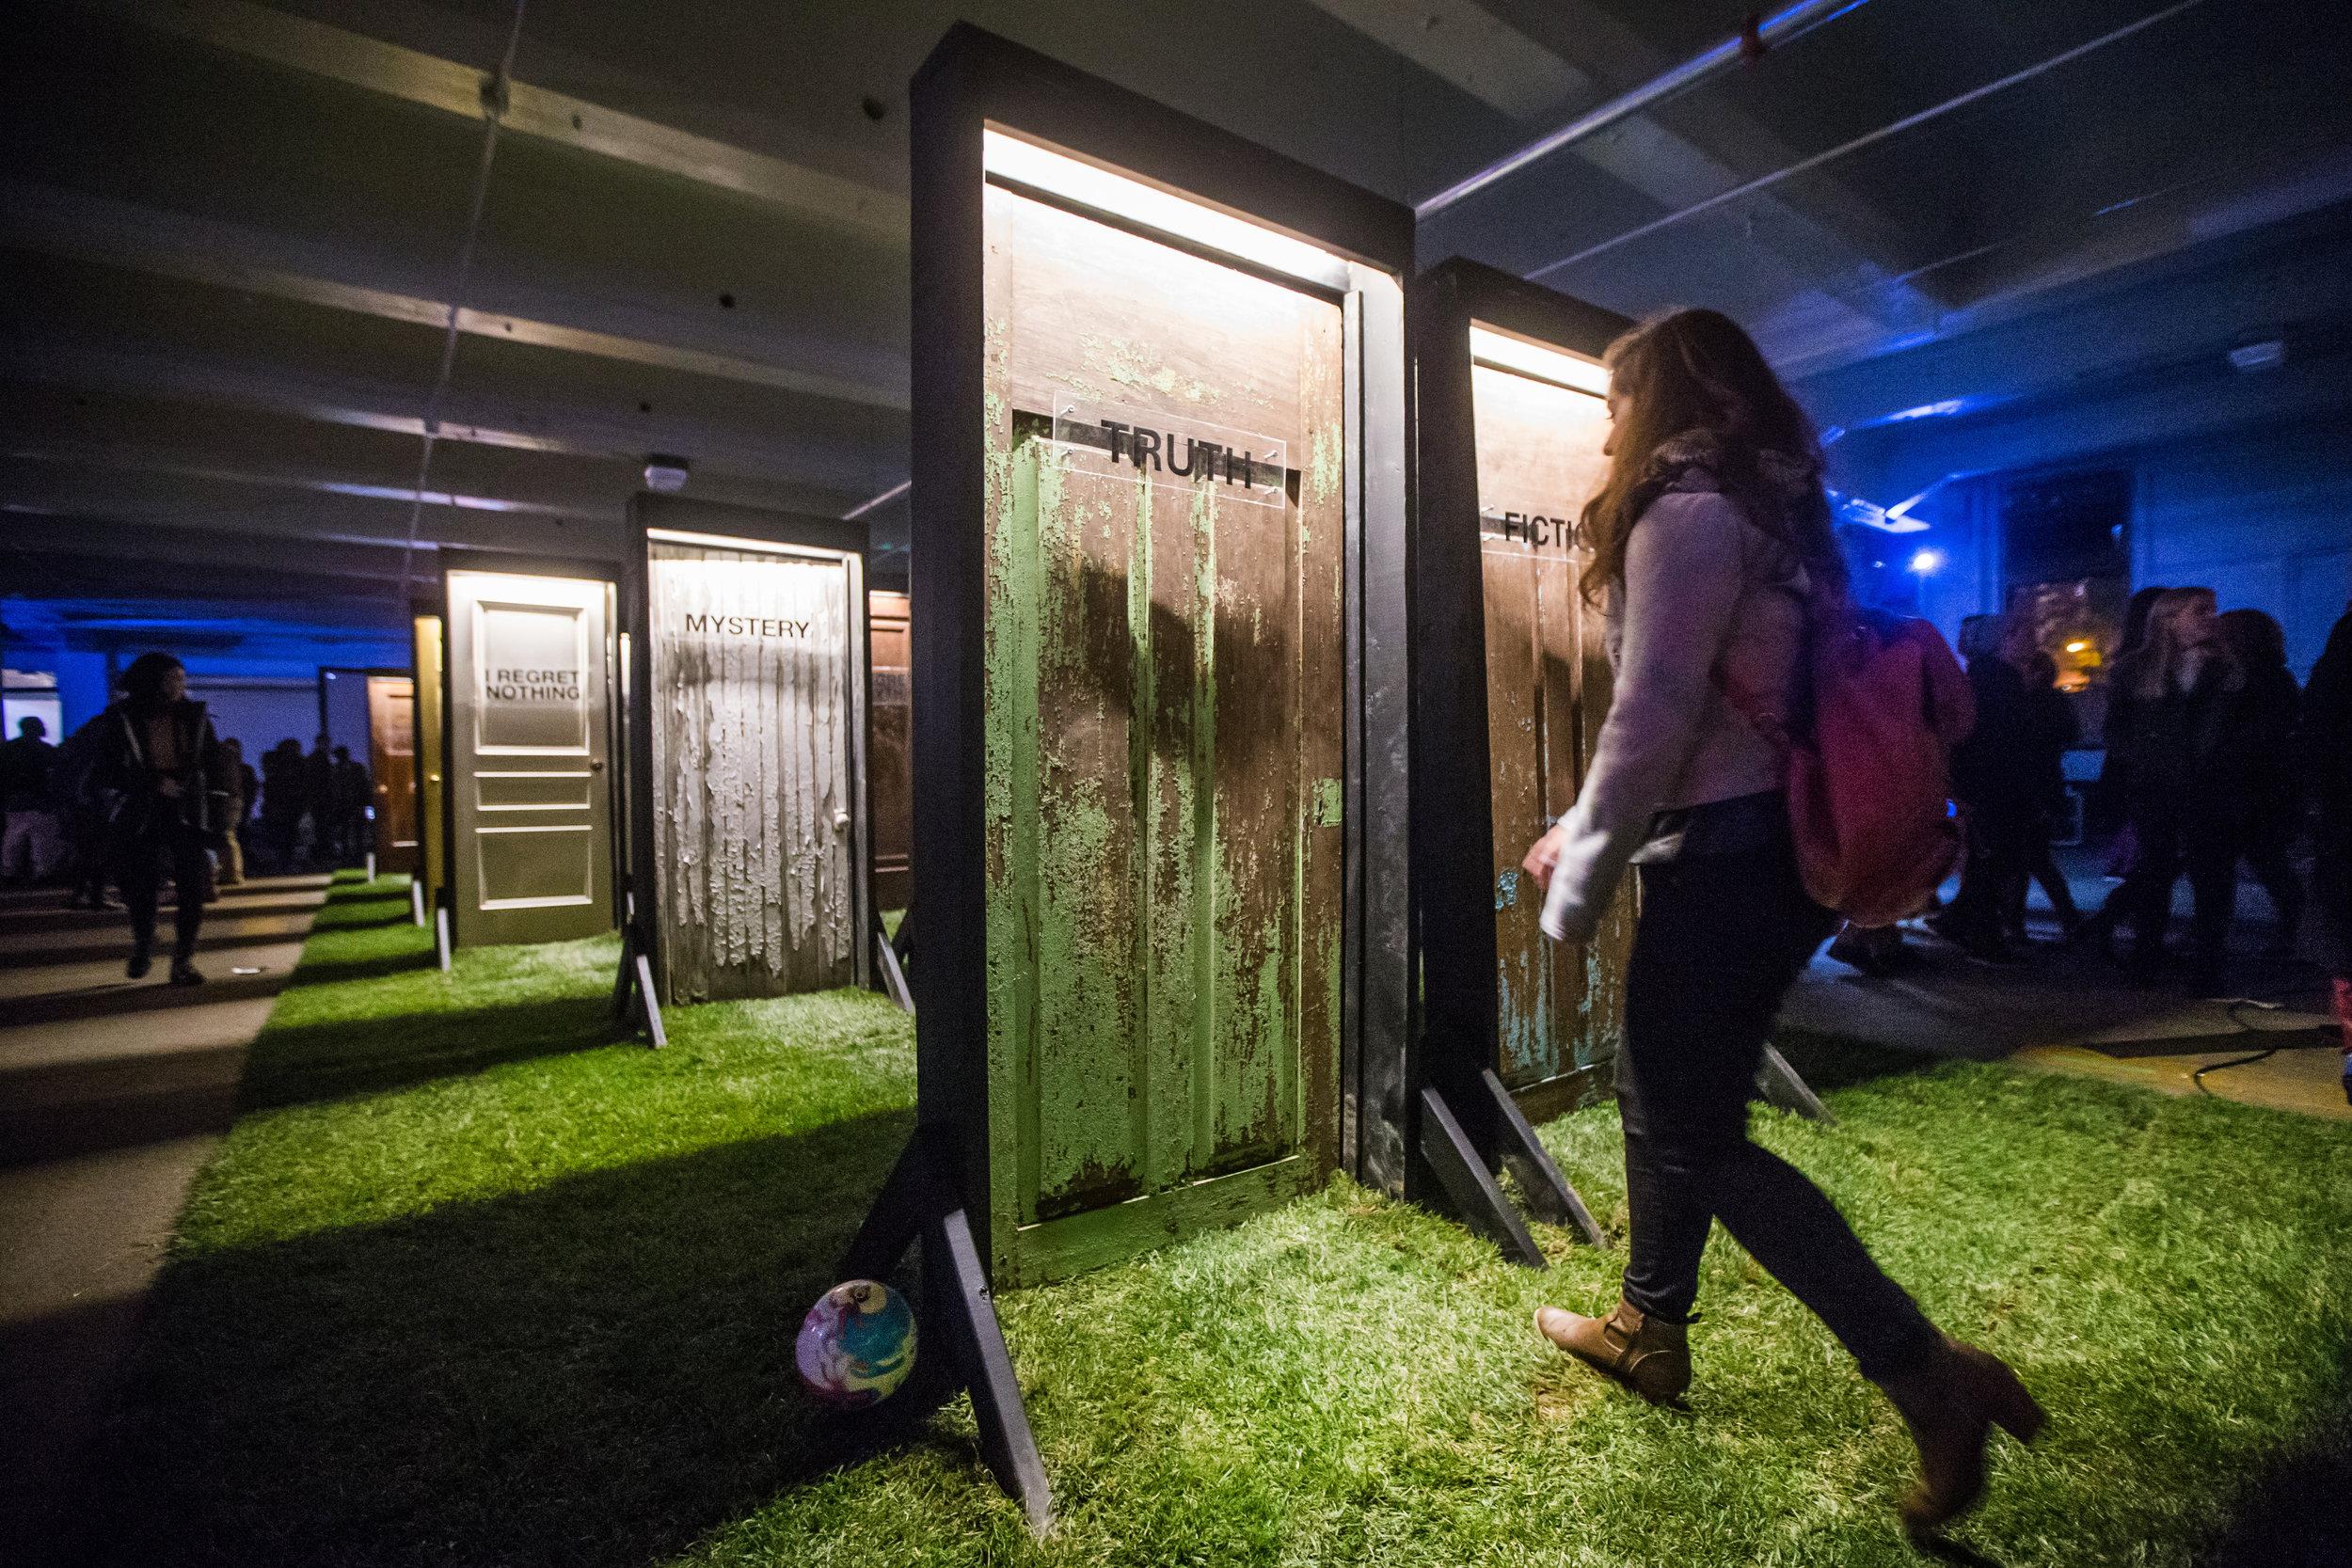 Between Doors_Labspace Studio (John Loerchner & Laura Mendes)_Illuminus 2015_Photo by Aram Boghosian_4.jpg